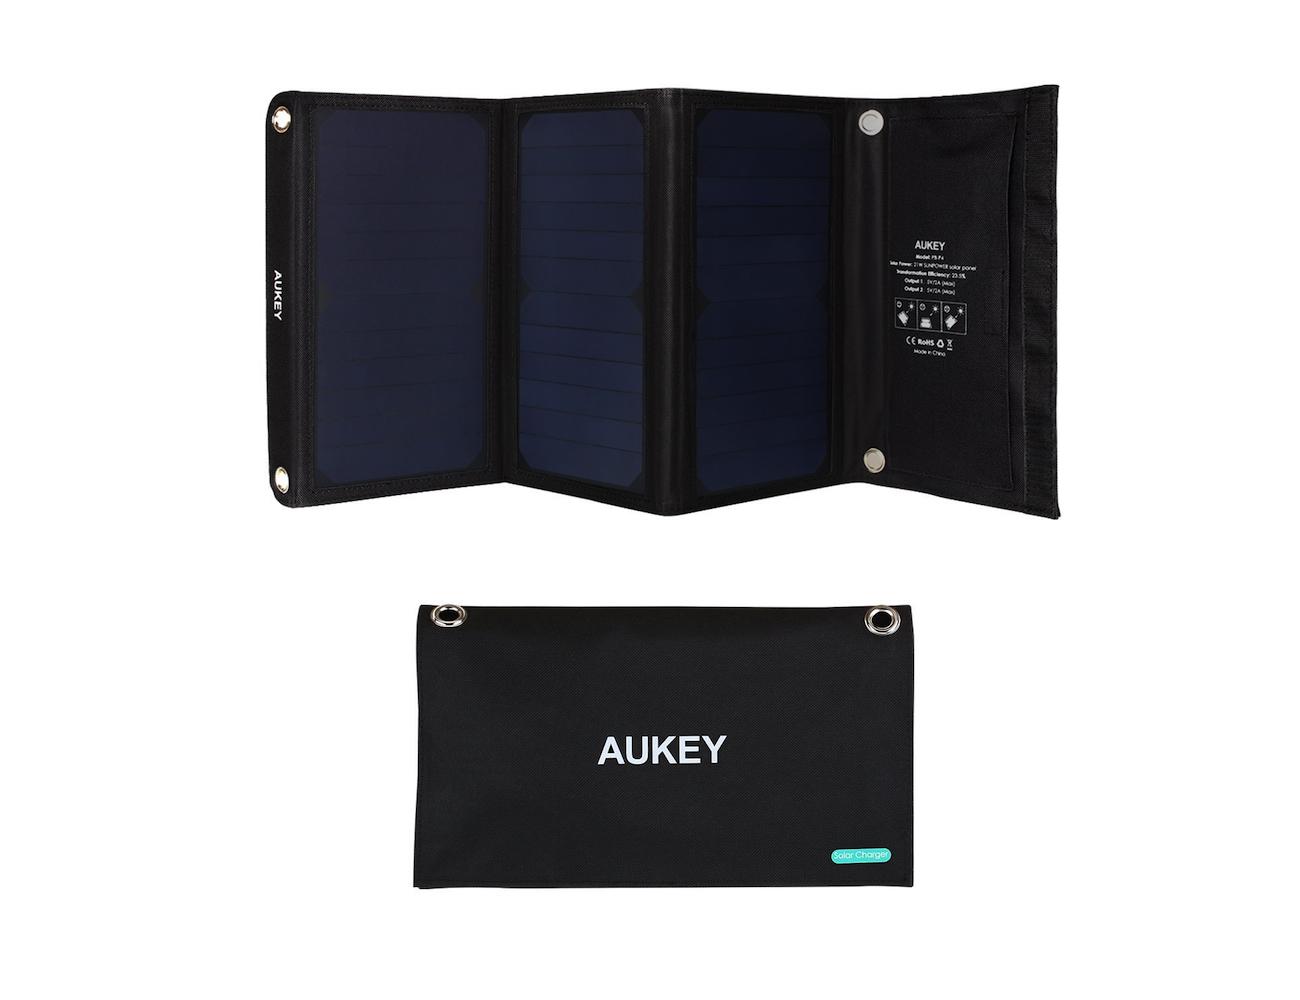 AUKEY SunPower Solar Panel Charger